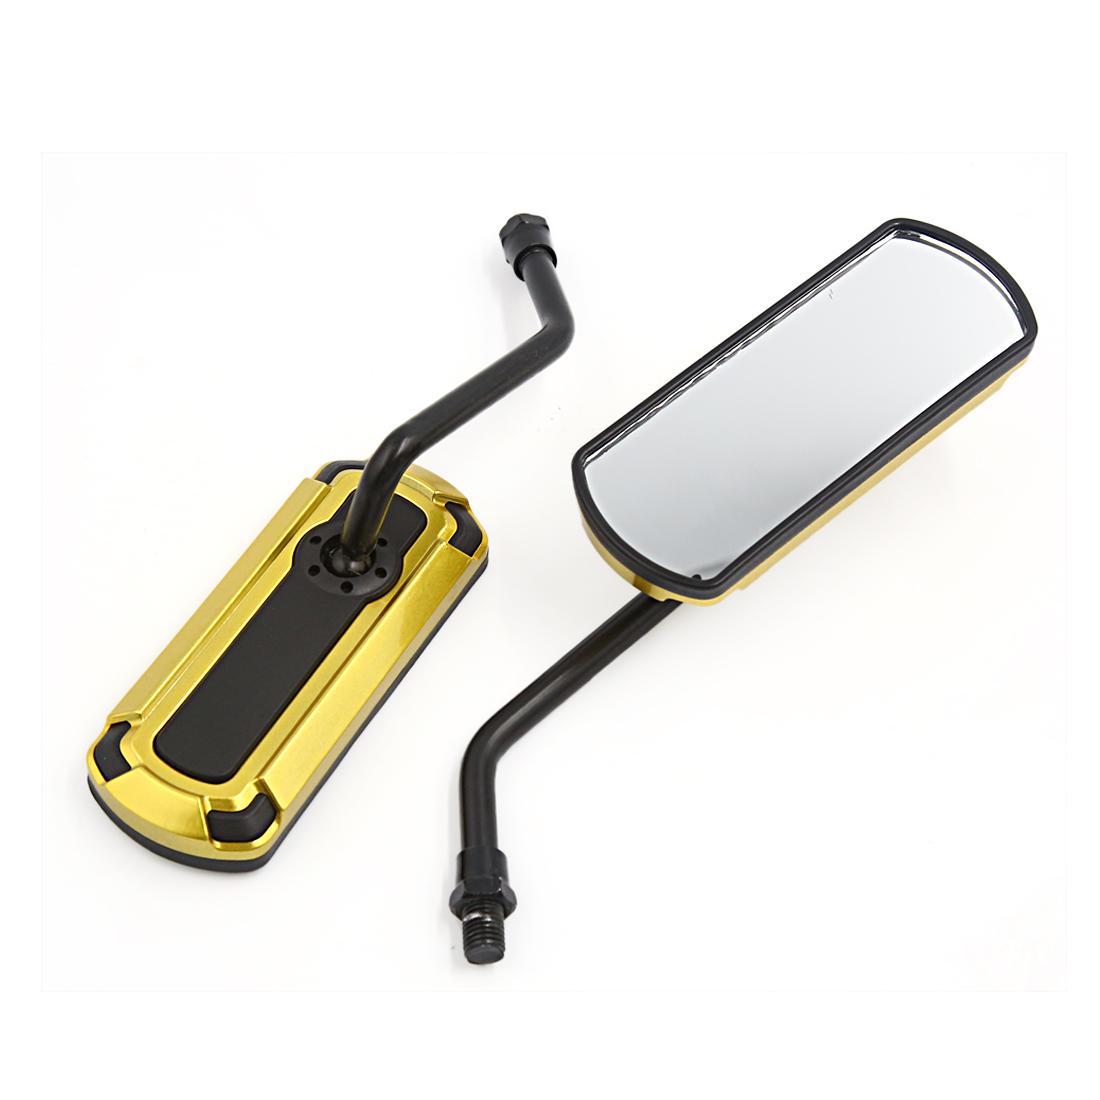 2pcs Gold Tone Aluminum Alloy Adjustable Motorcycle Rear View Mirror